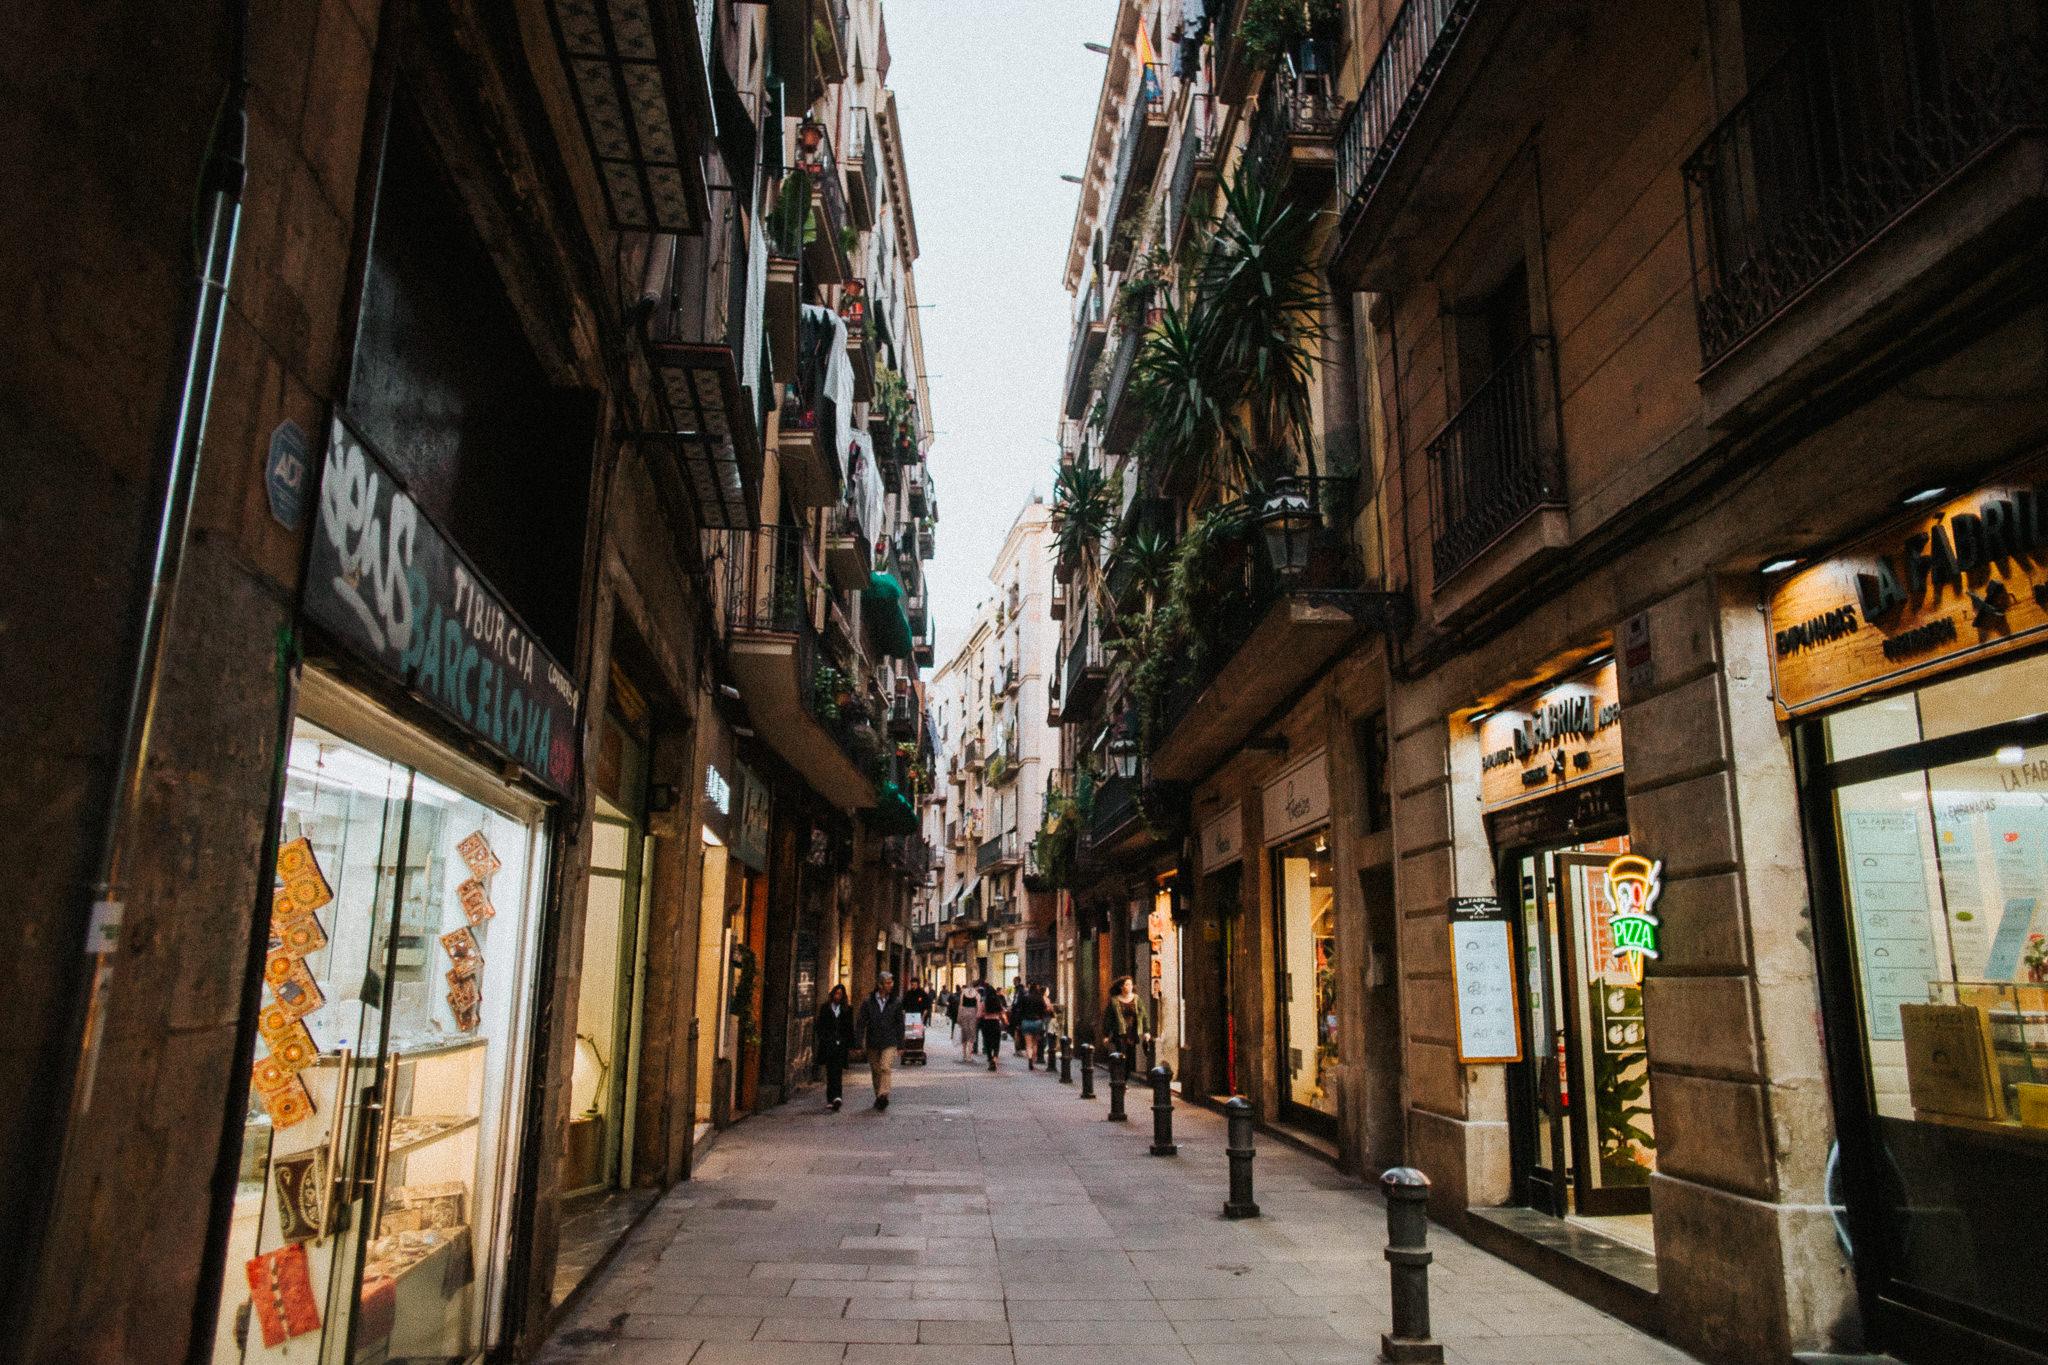 Barcelona-destination-photographer-alfred-tang-20.jpg